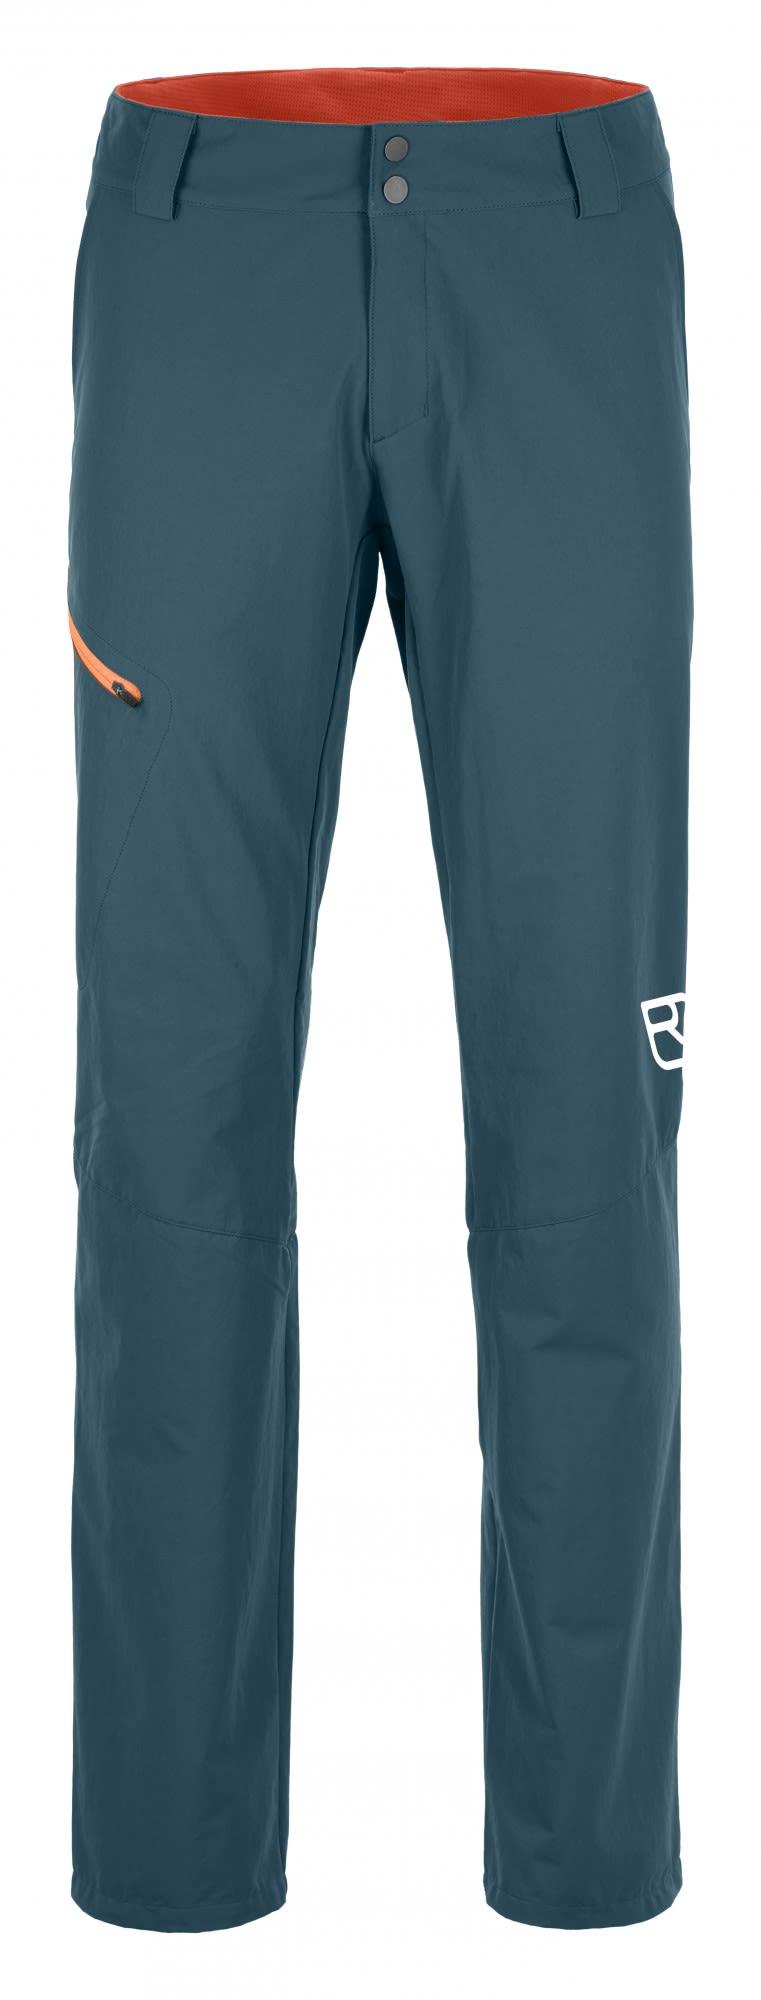 Ortovox Merino Shield Zero Pelmo Pants (Modell Sommer 2018) Blau, Male Merino Ho